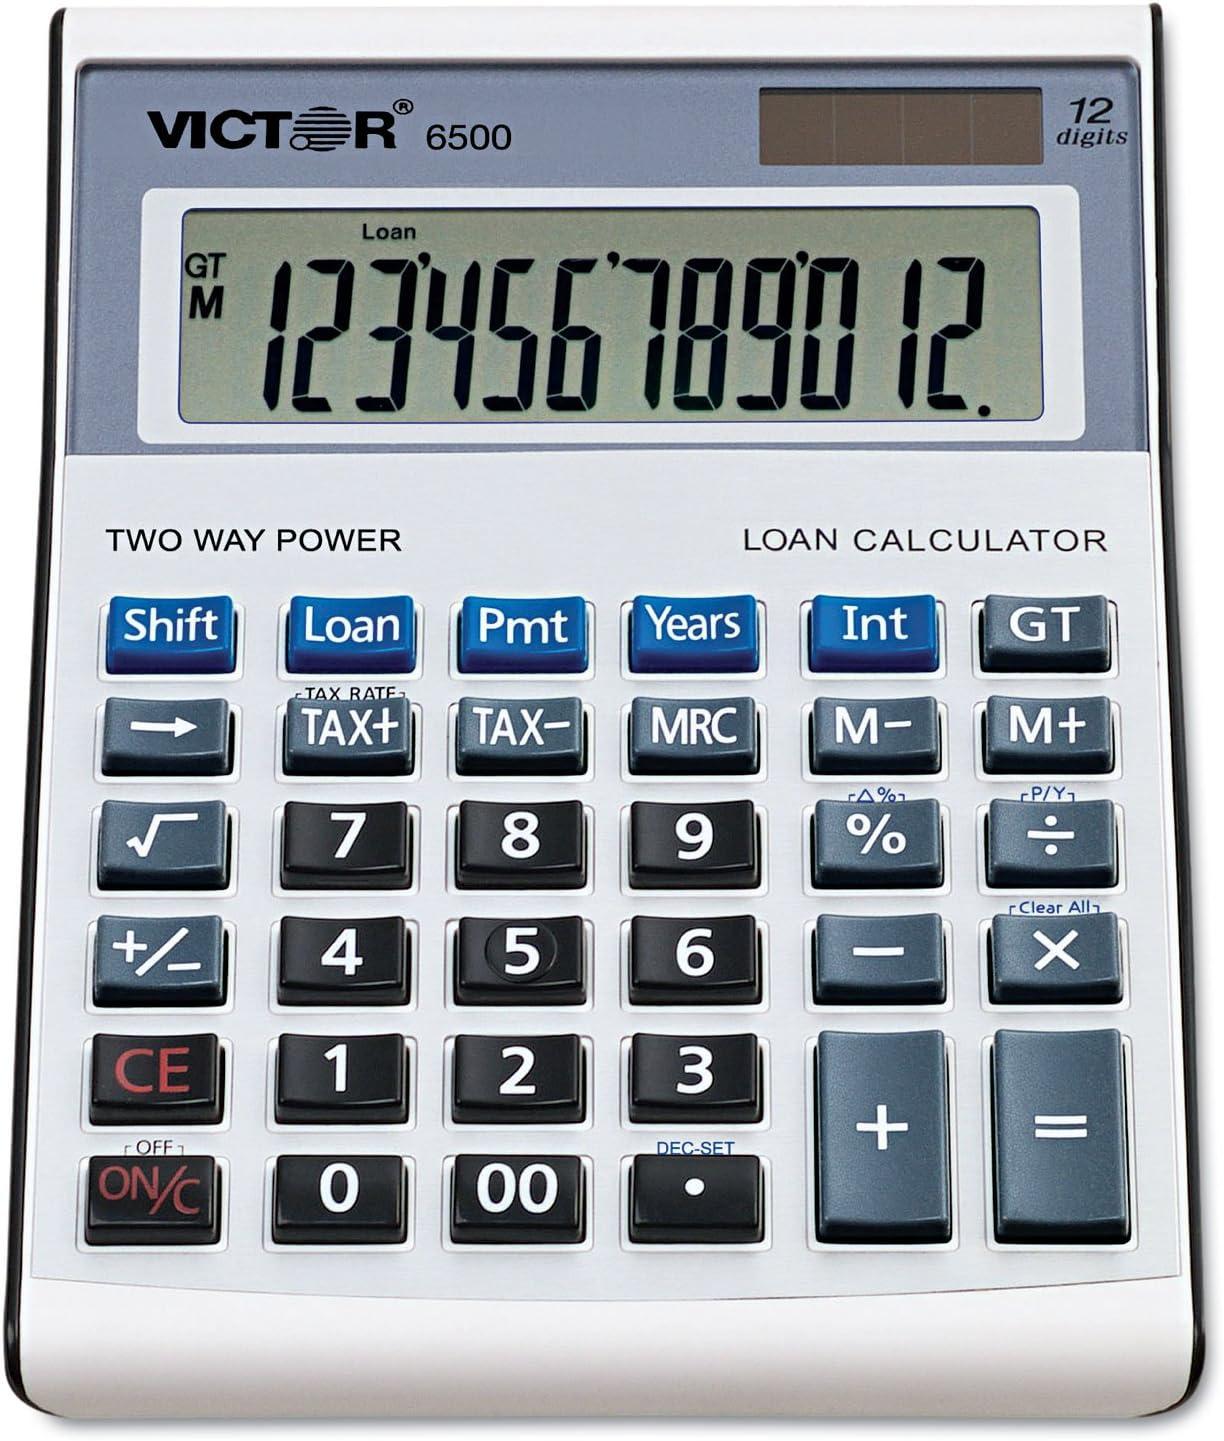 VICTOR TECHNOLOGIES 6500 famous Executive Loan Max 72% OFF 12- Desktop Calculator